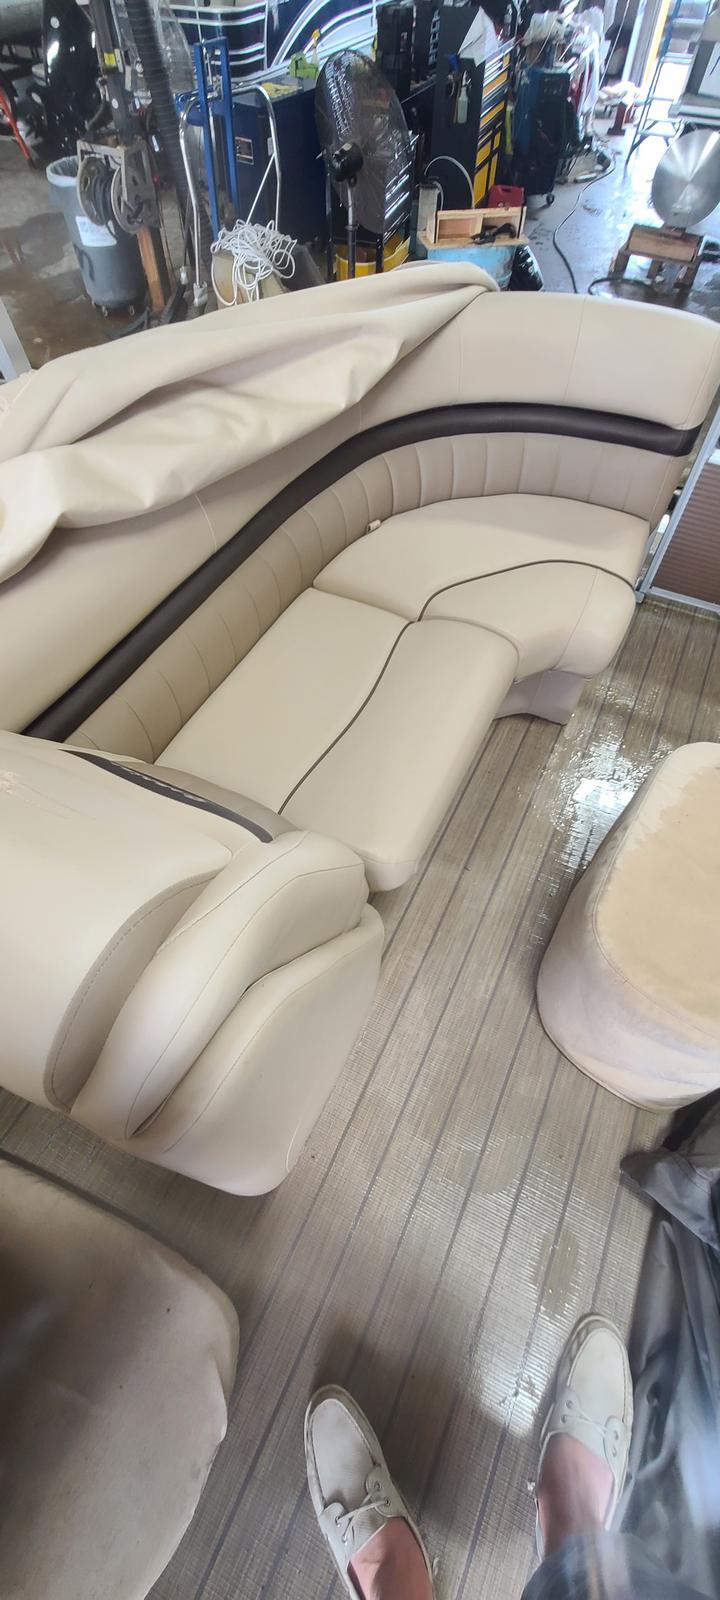 2018 Bennington boat for sale, model of the boat is 22 GSR & Image # 7 of 9